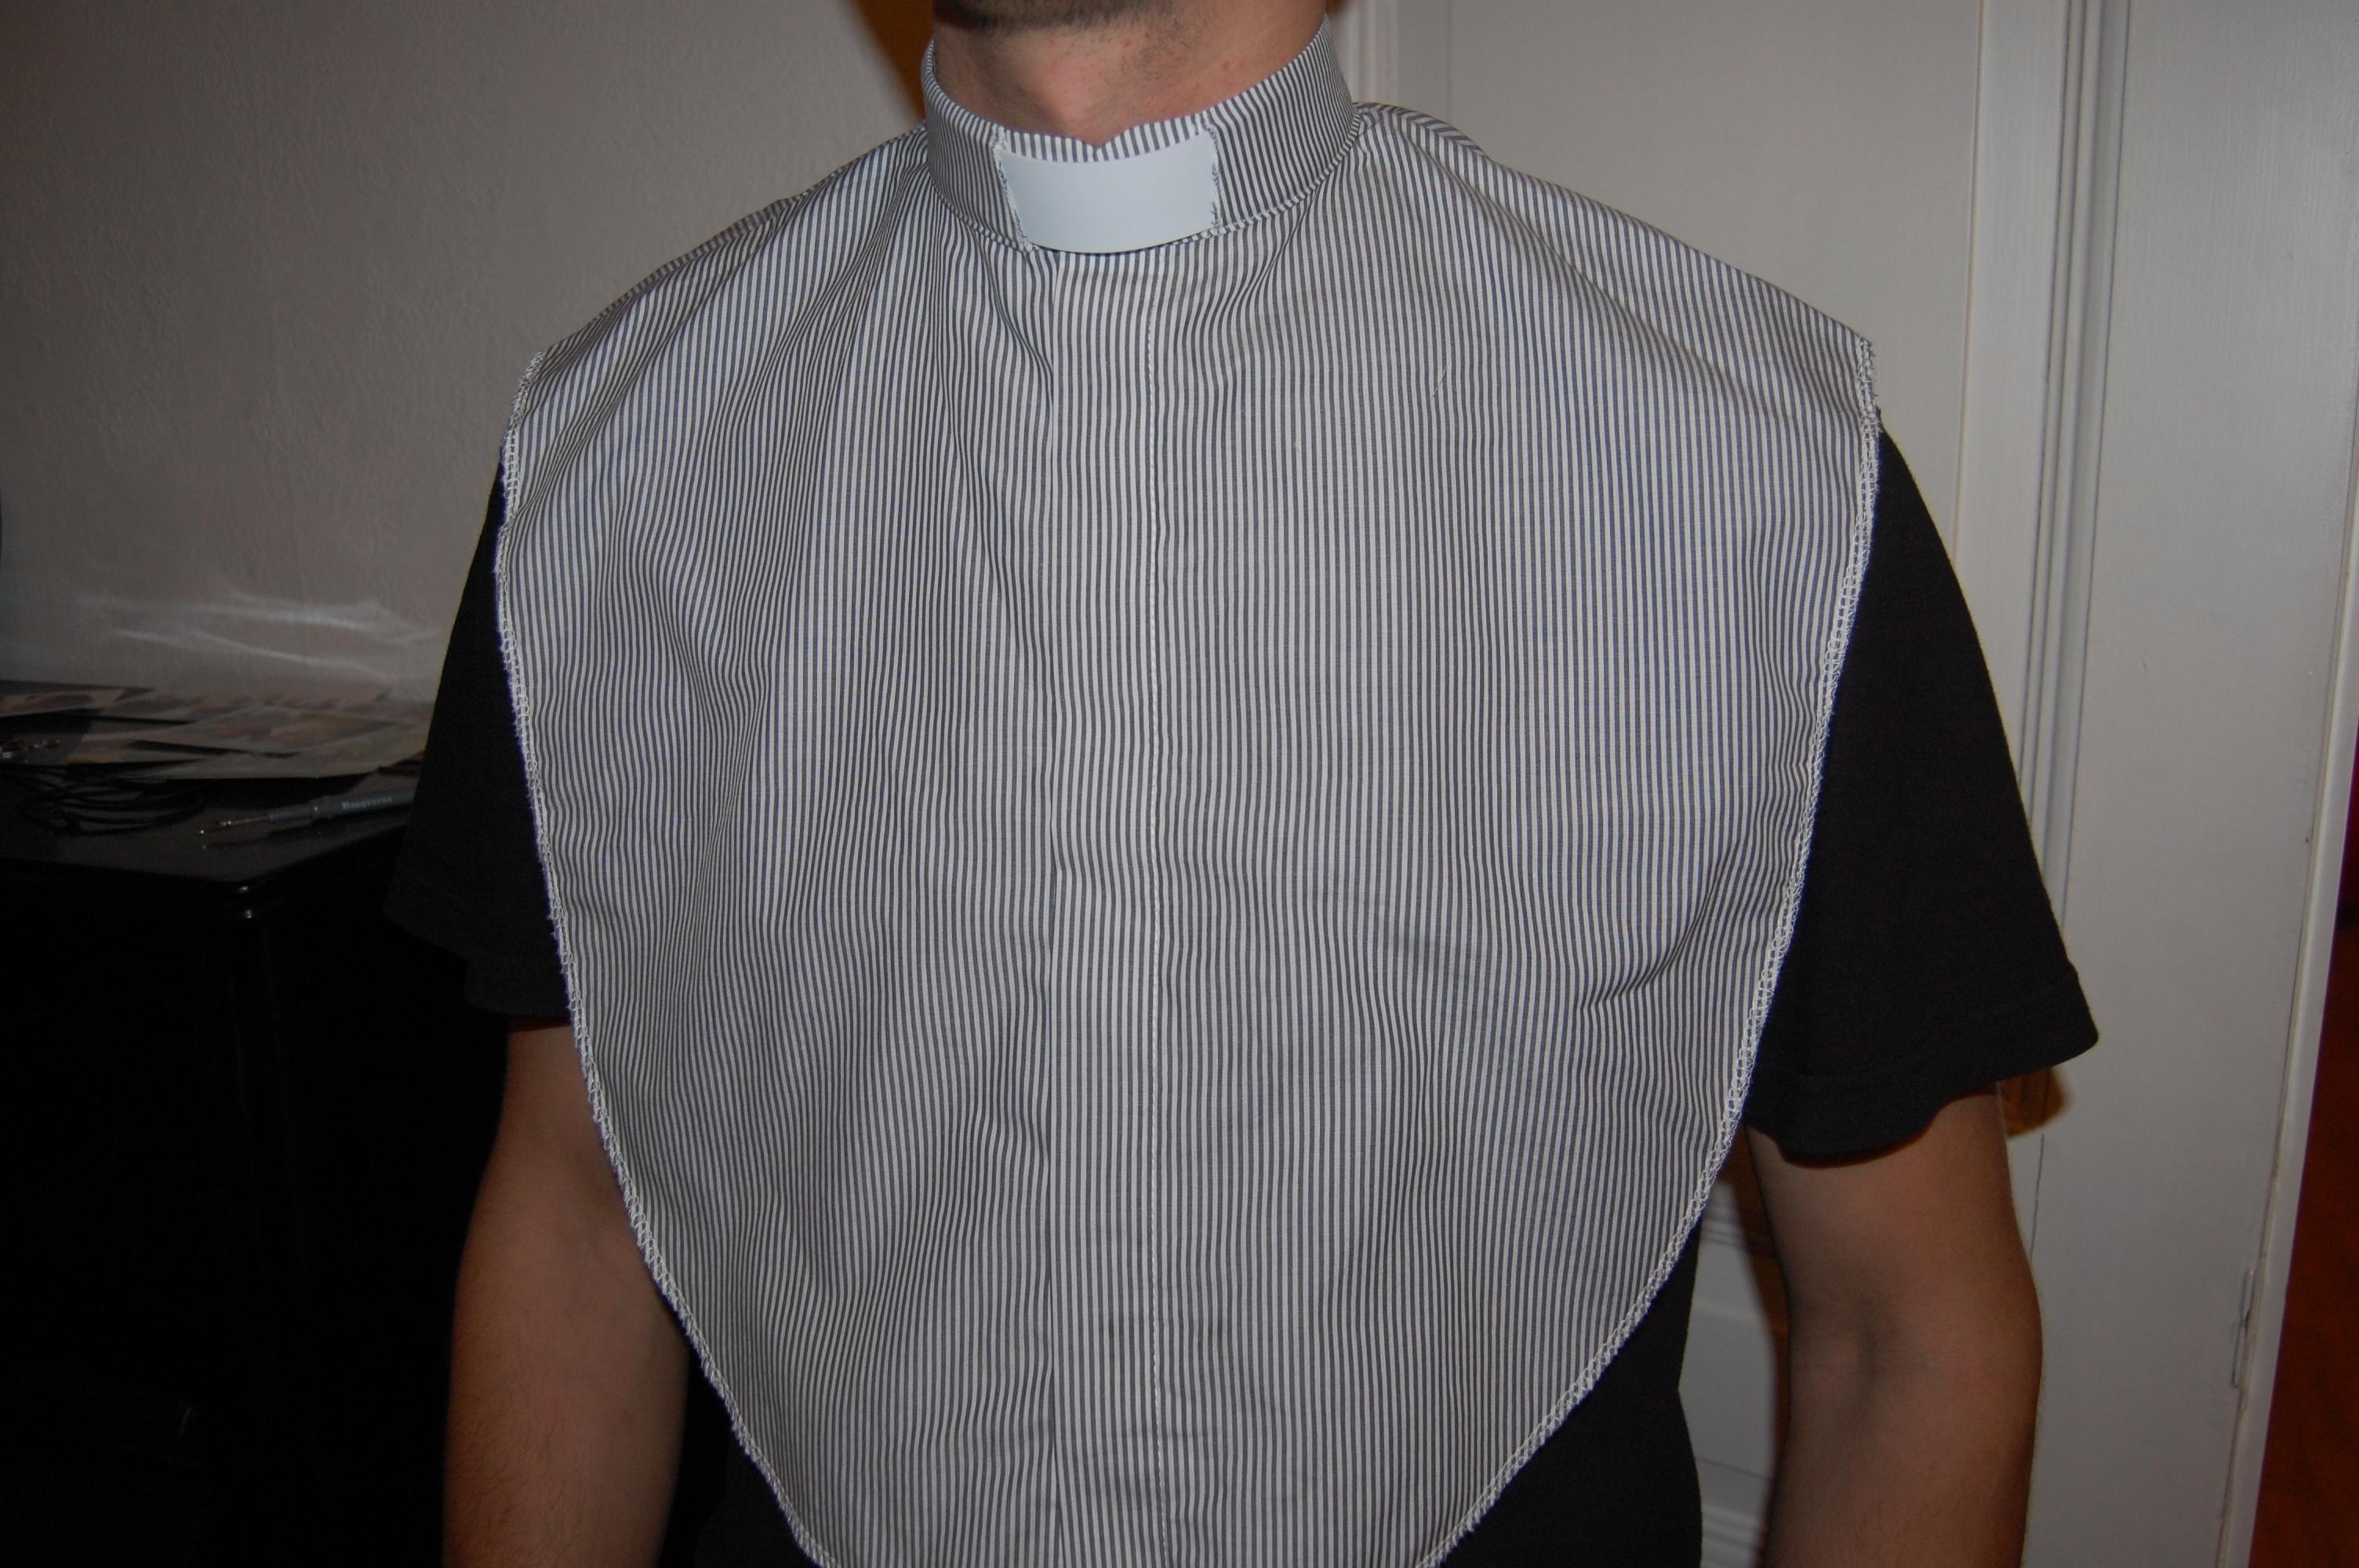 Skjortbröst